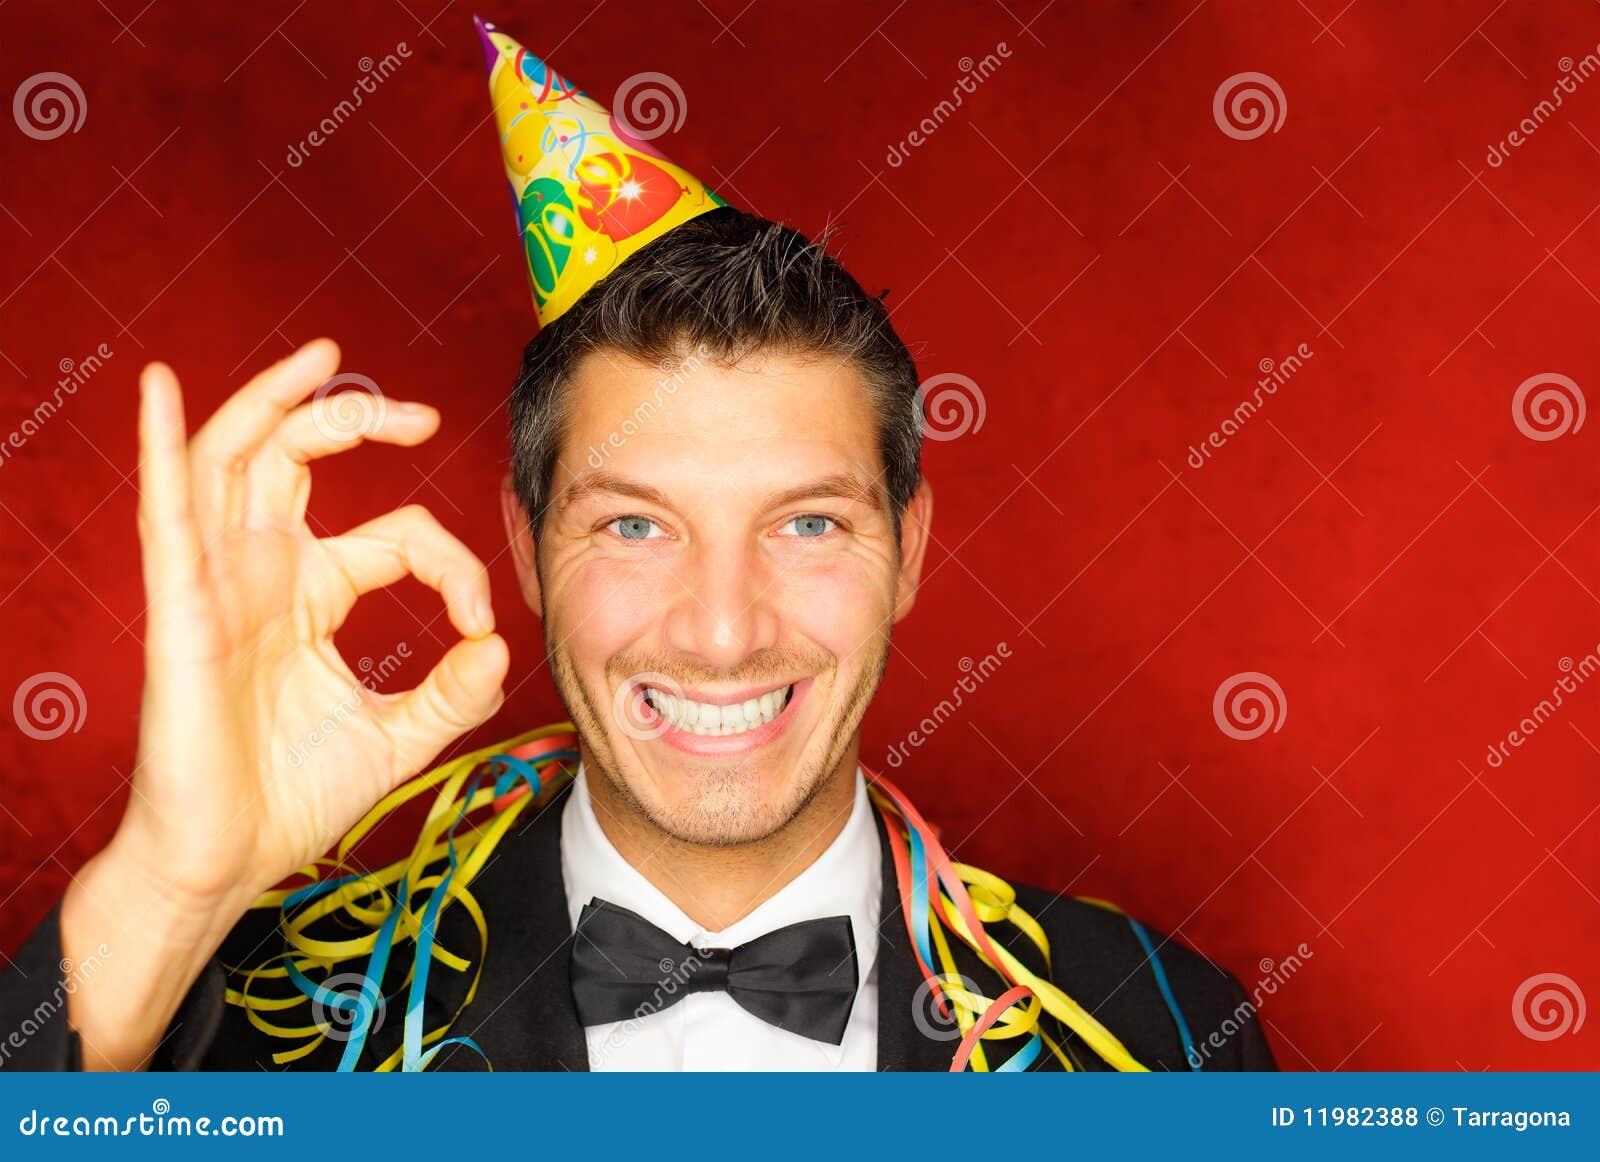 La persona del partido celebra Año Nuevo